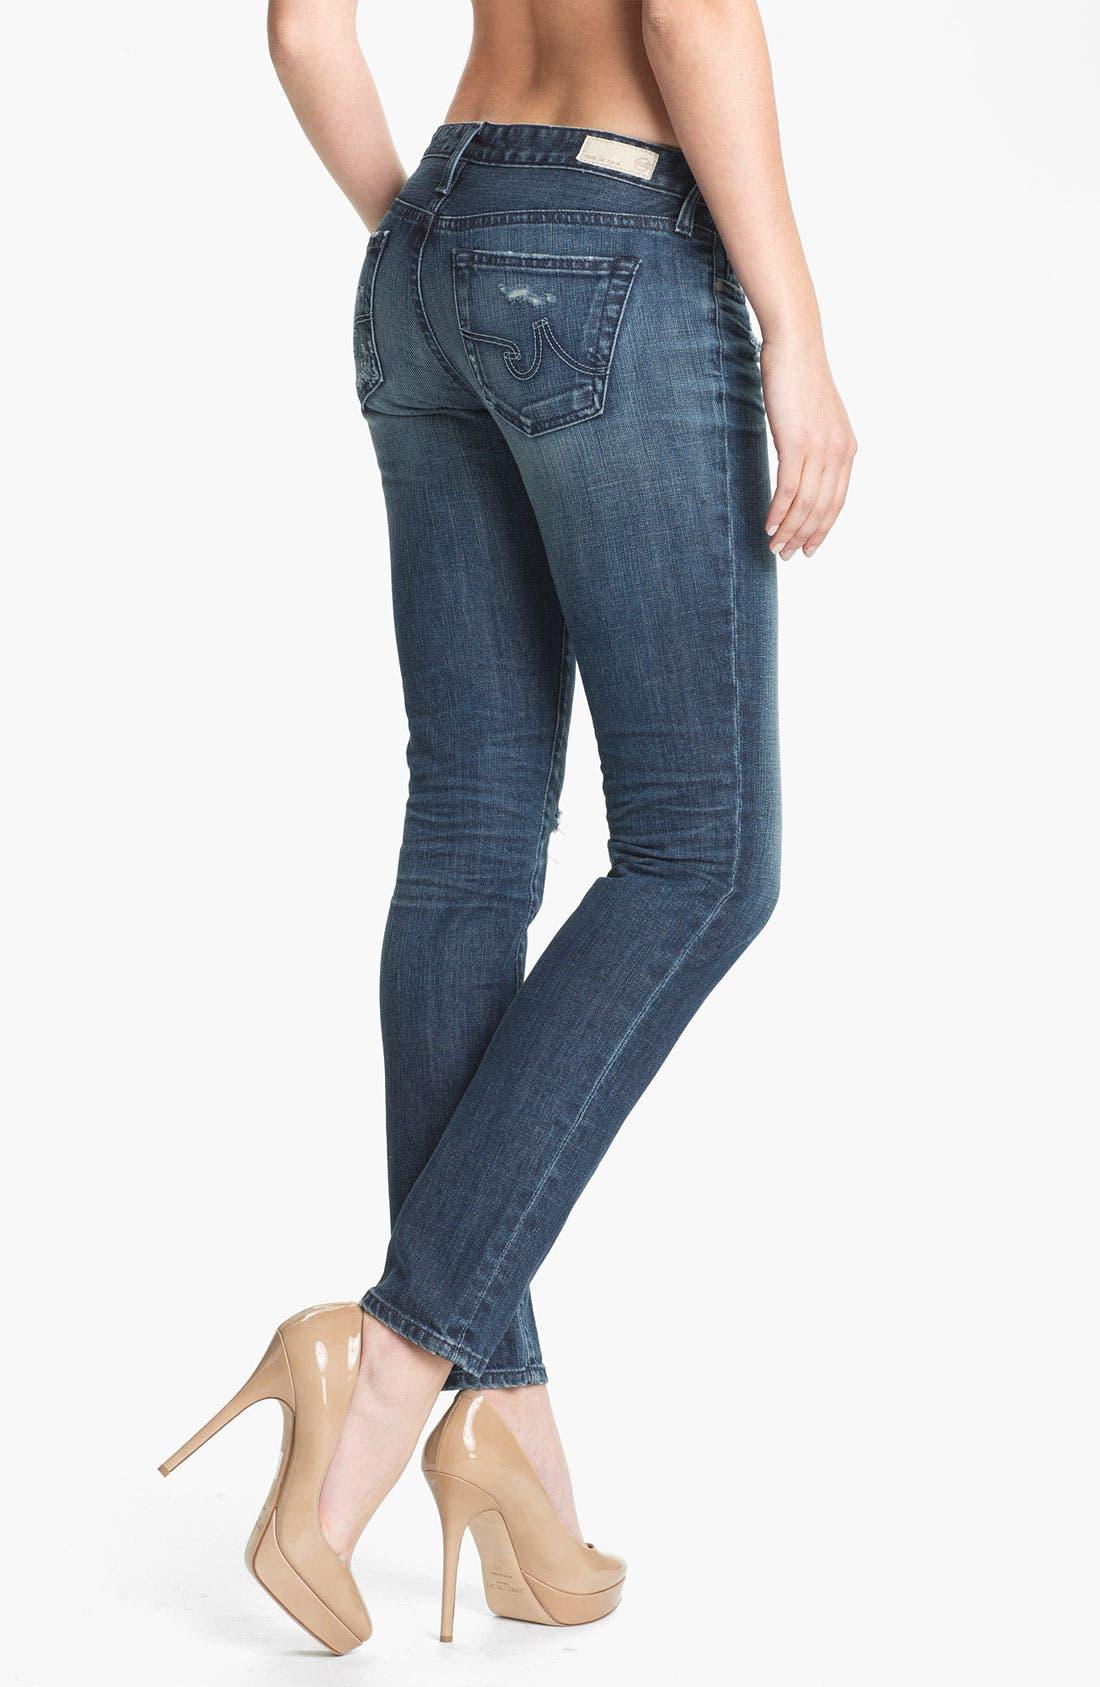 Alternate Image 2  - AG Jeans 'The Stilt' Cigarette Leg Stretch Jeans (7 Year Destroy)